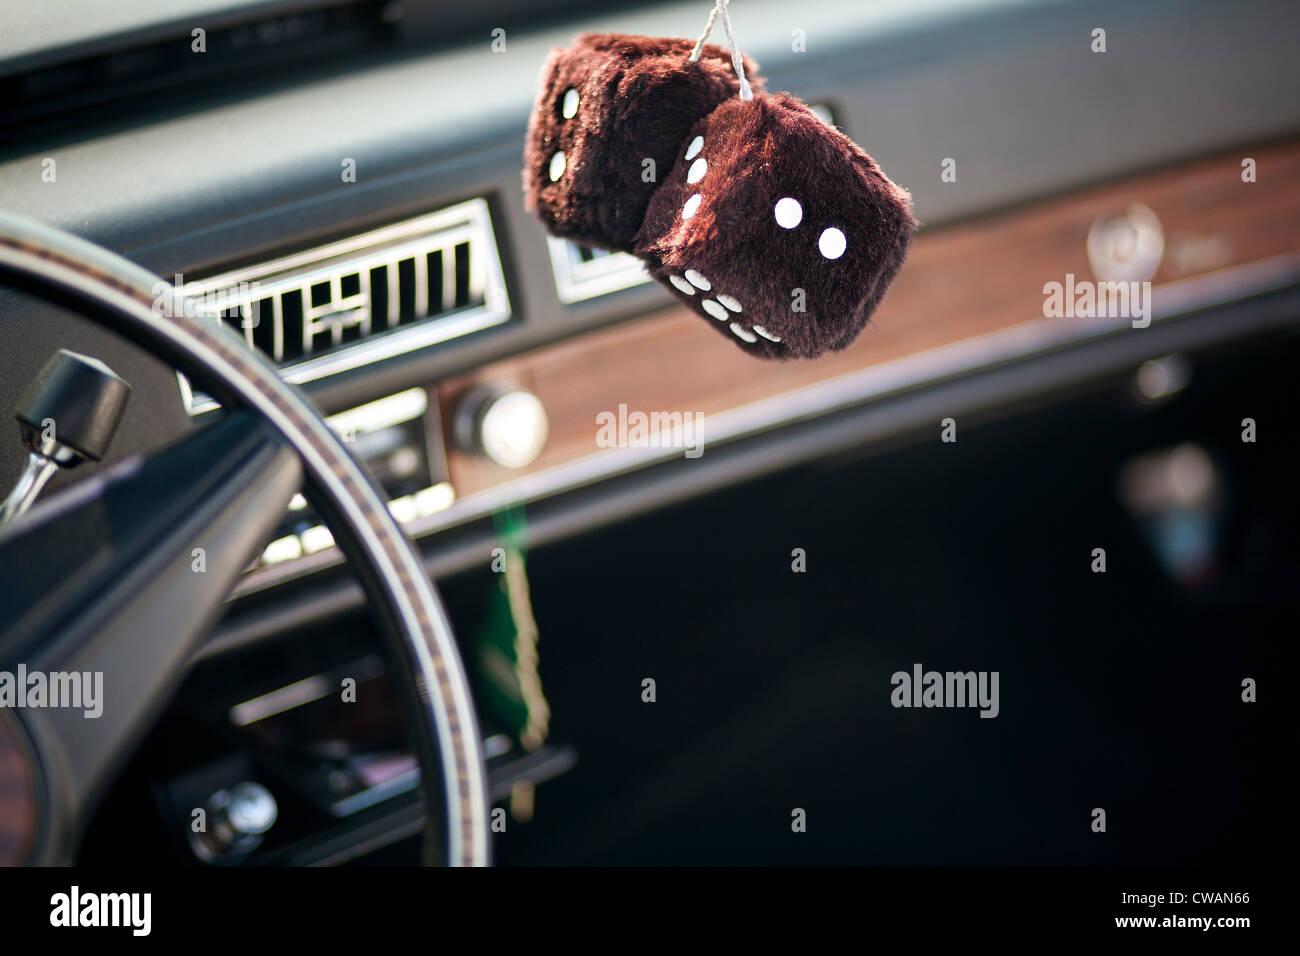 Pelzigen Würfel hängen im Auto Stockbild